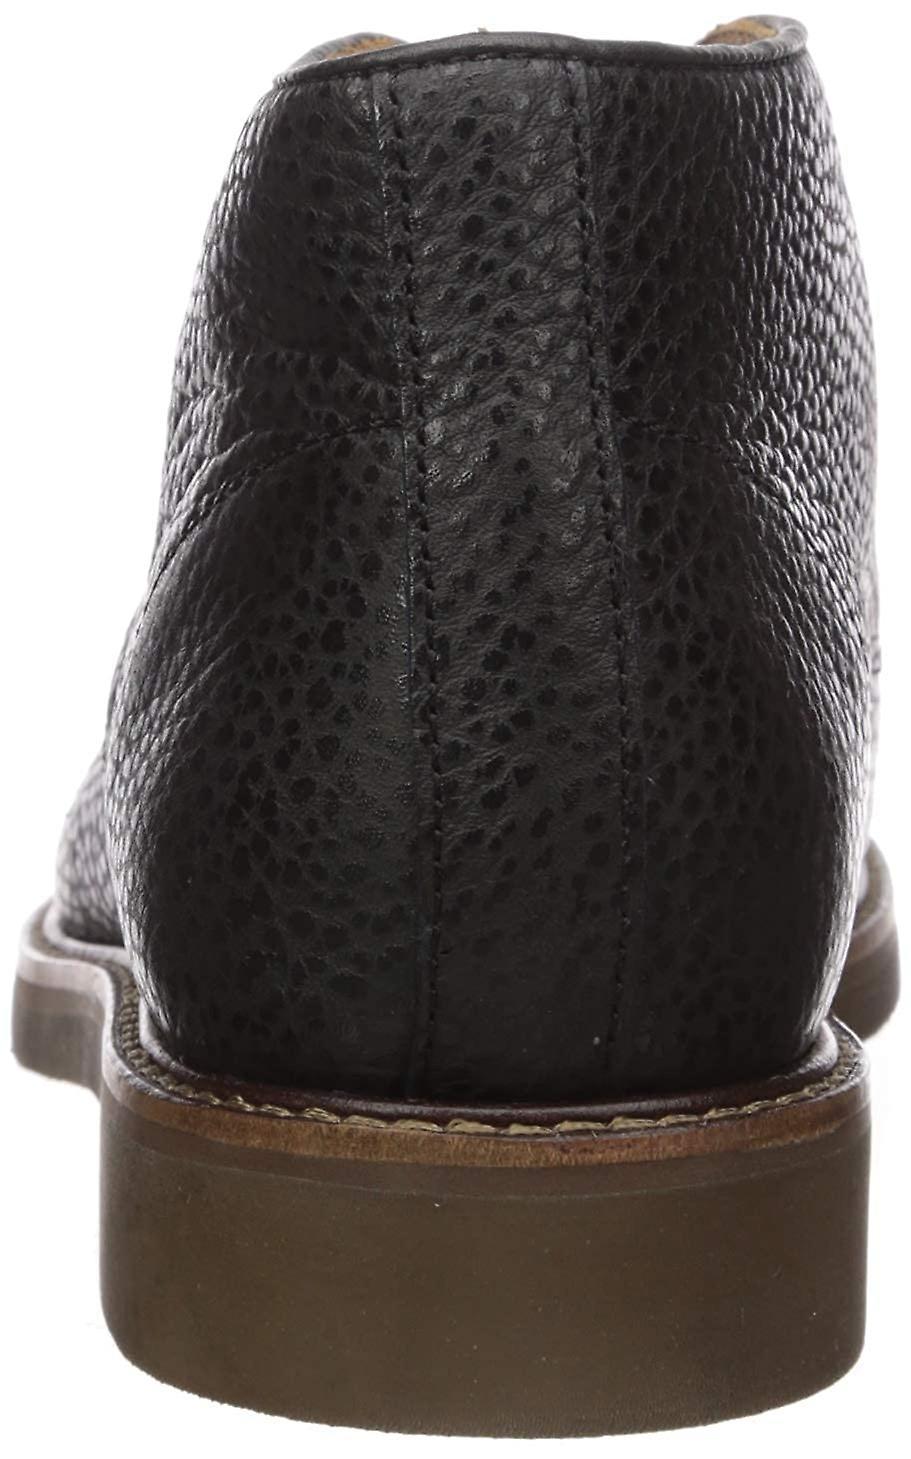 MARC JOSEPH NEW YORK Men-apos;s Cuir De luxe Lug Boot Ankle